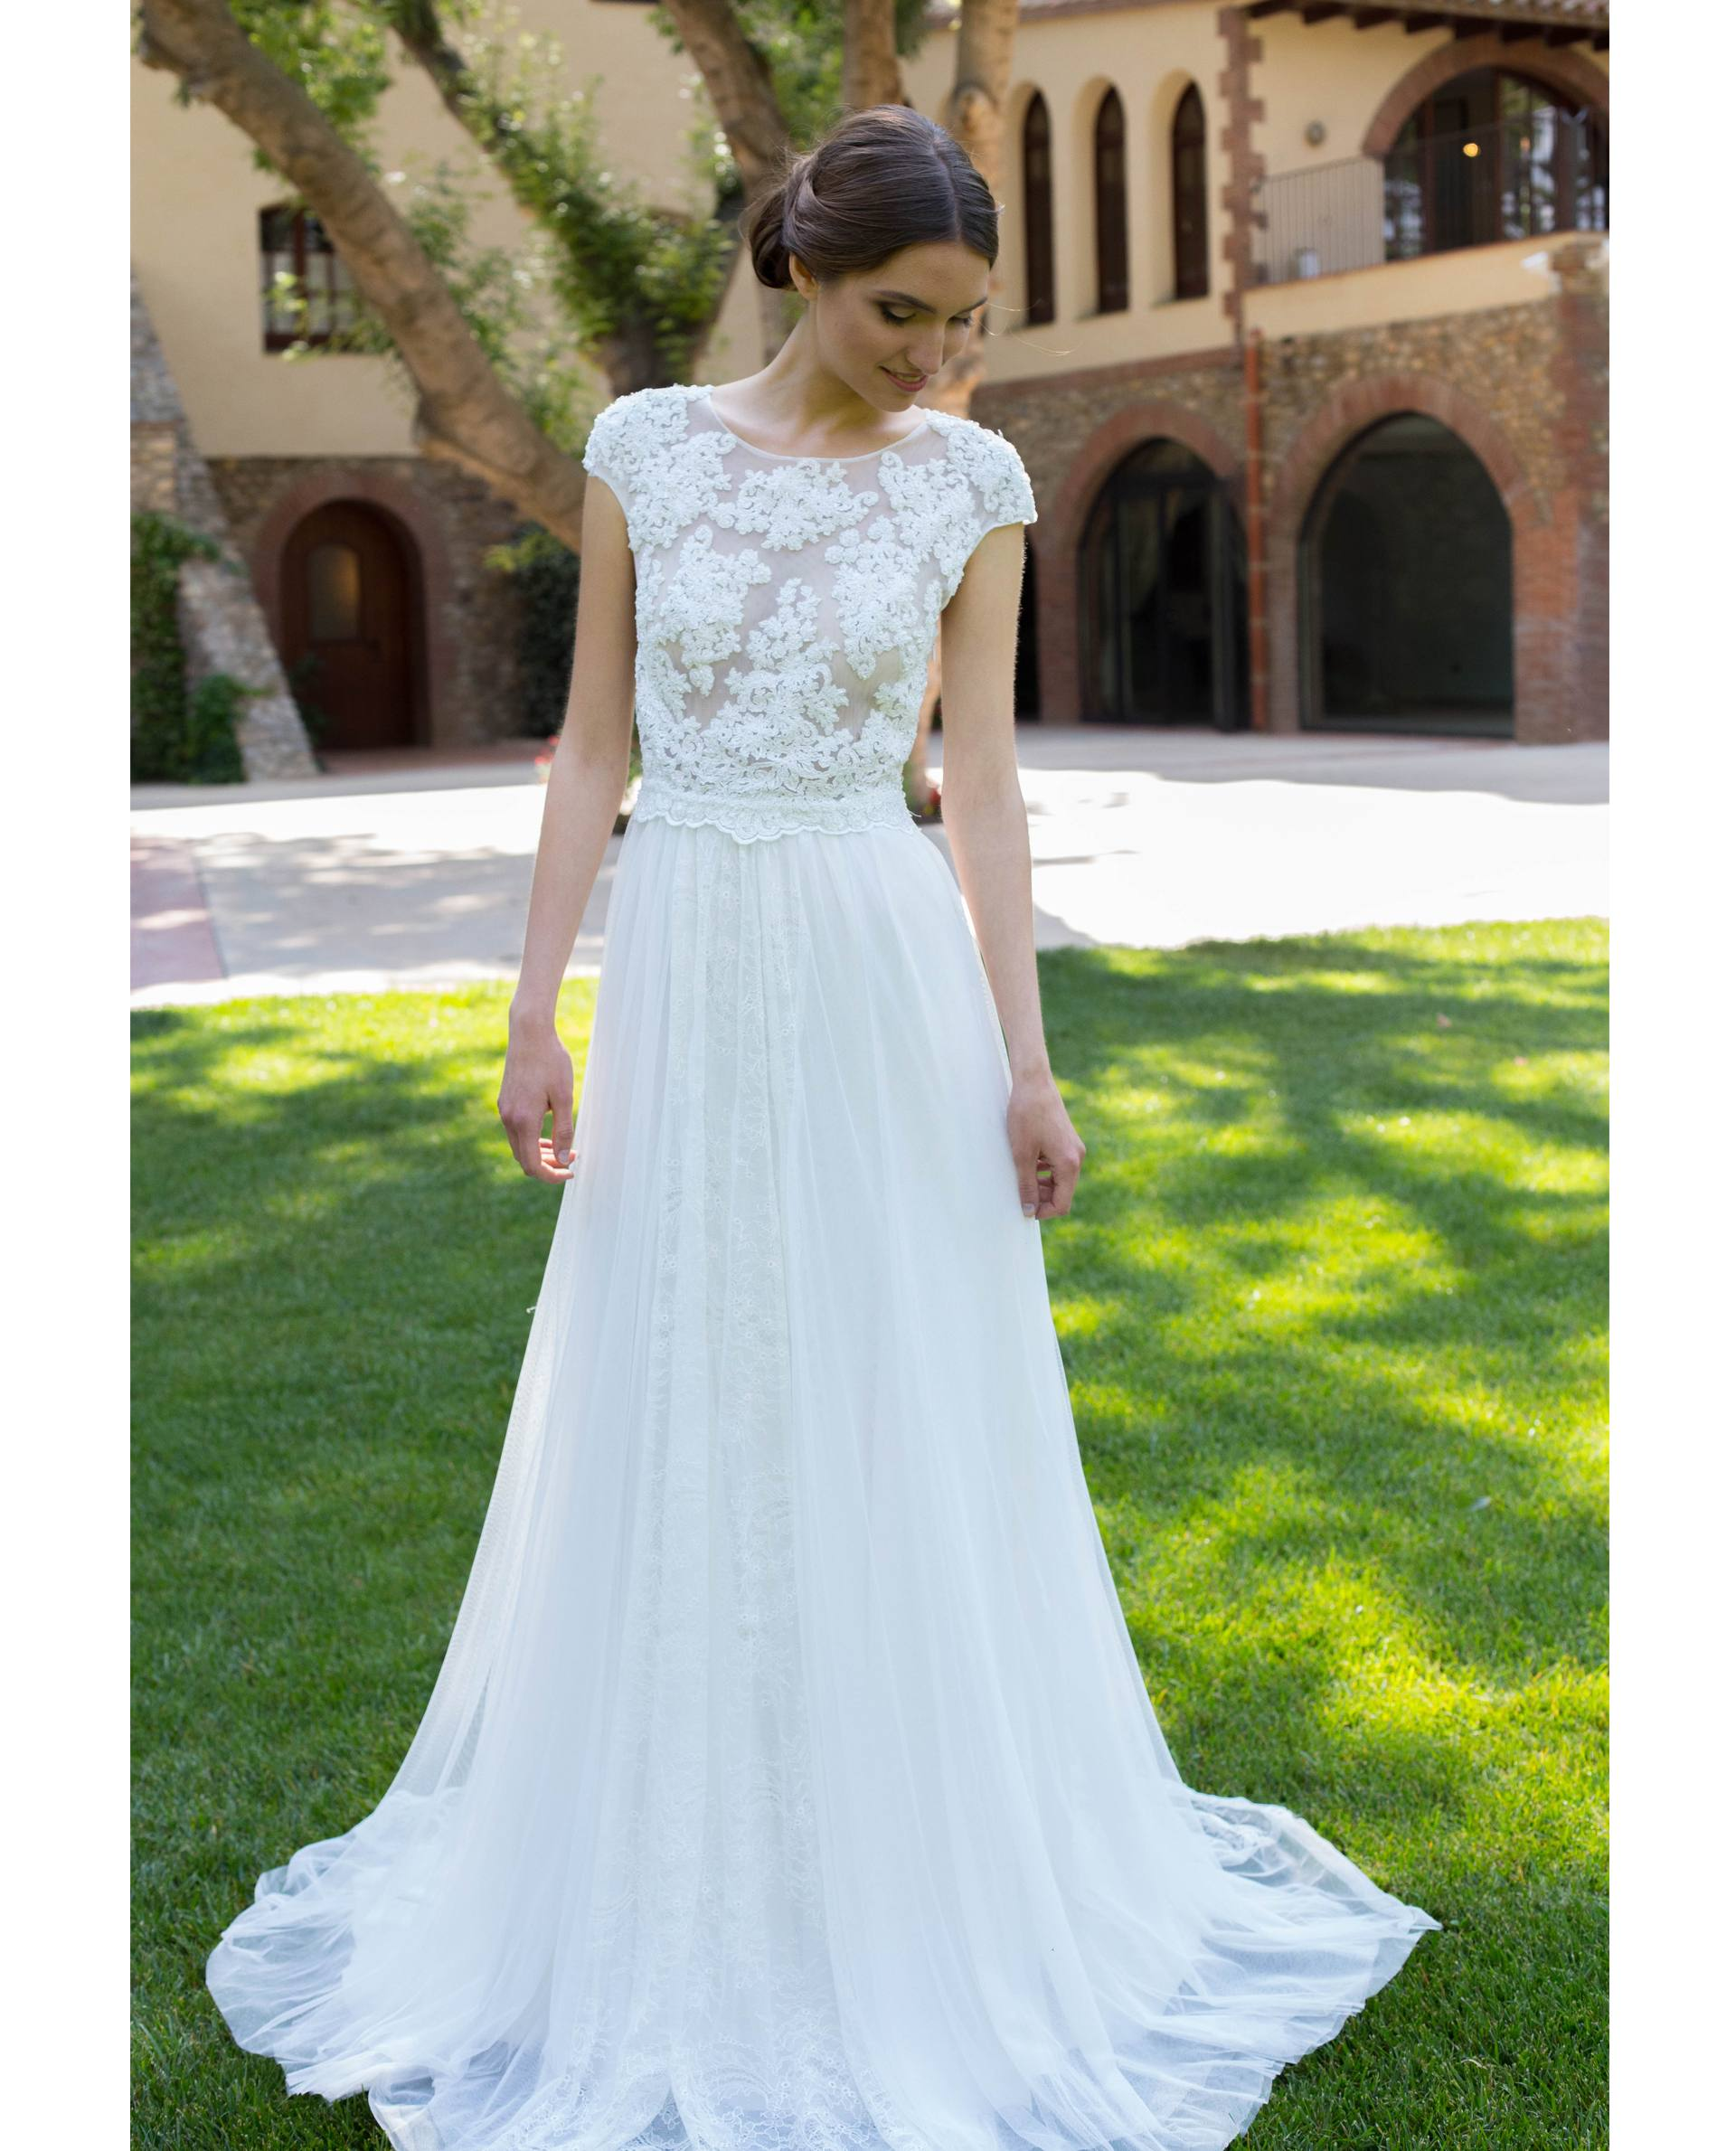 BRIDAL-NATURE 2017/18 - VESTIDOS - vestido novia Alba